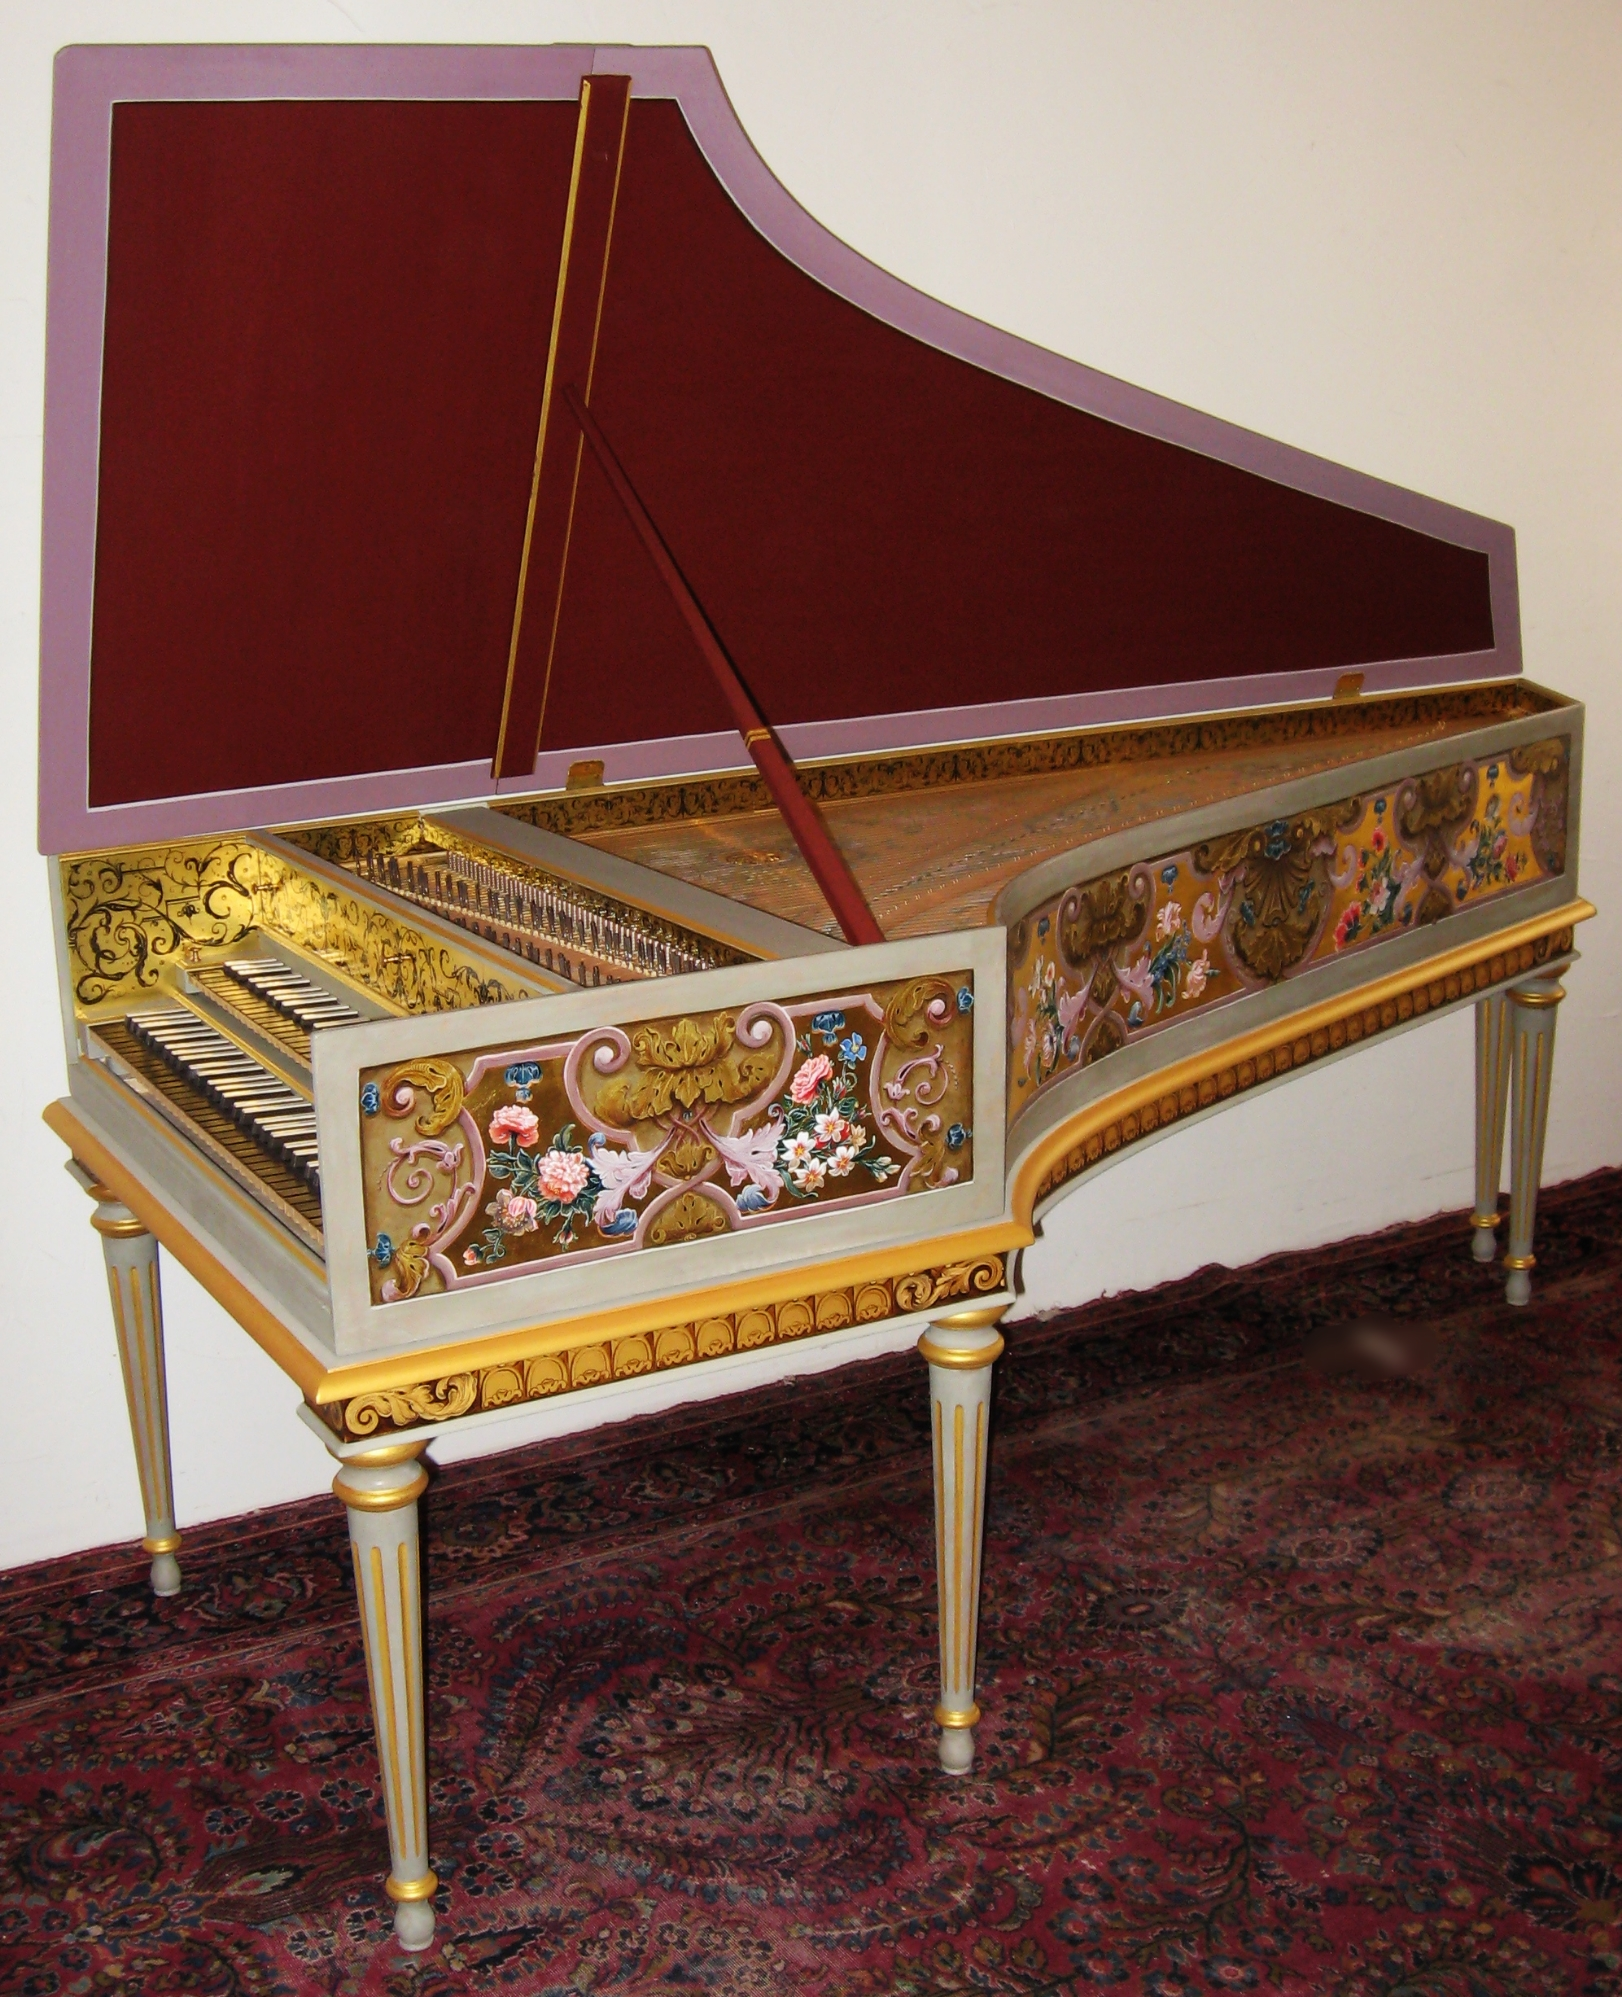 Harpsichord after f. blanchet in paris, france my opus 3 9 8 made in 2 0 0 8 belongs to Elizabeth Farr in boulder, colorado